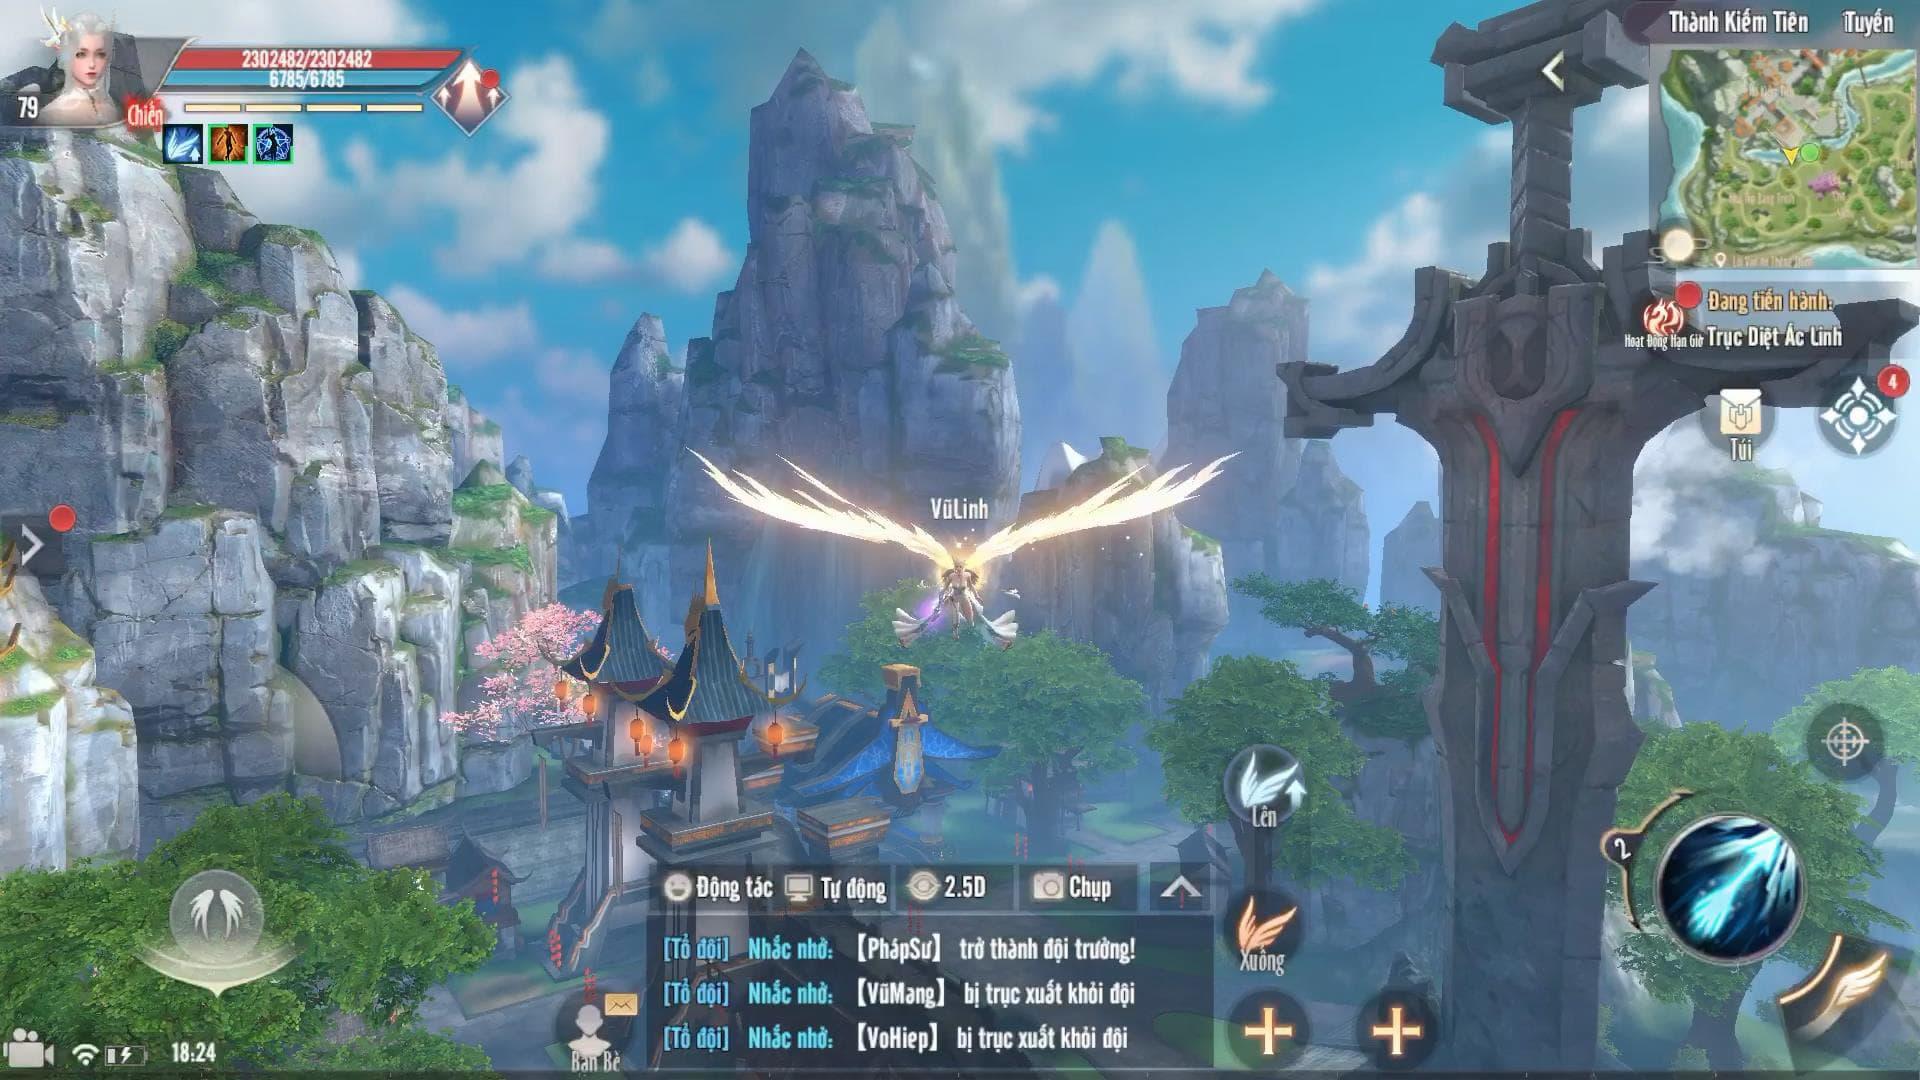 game online cày cuốc 3d Perfect World